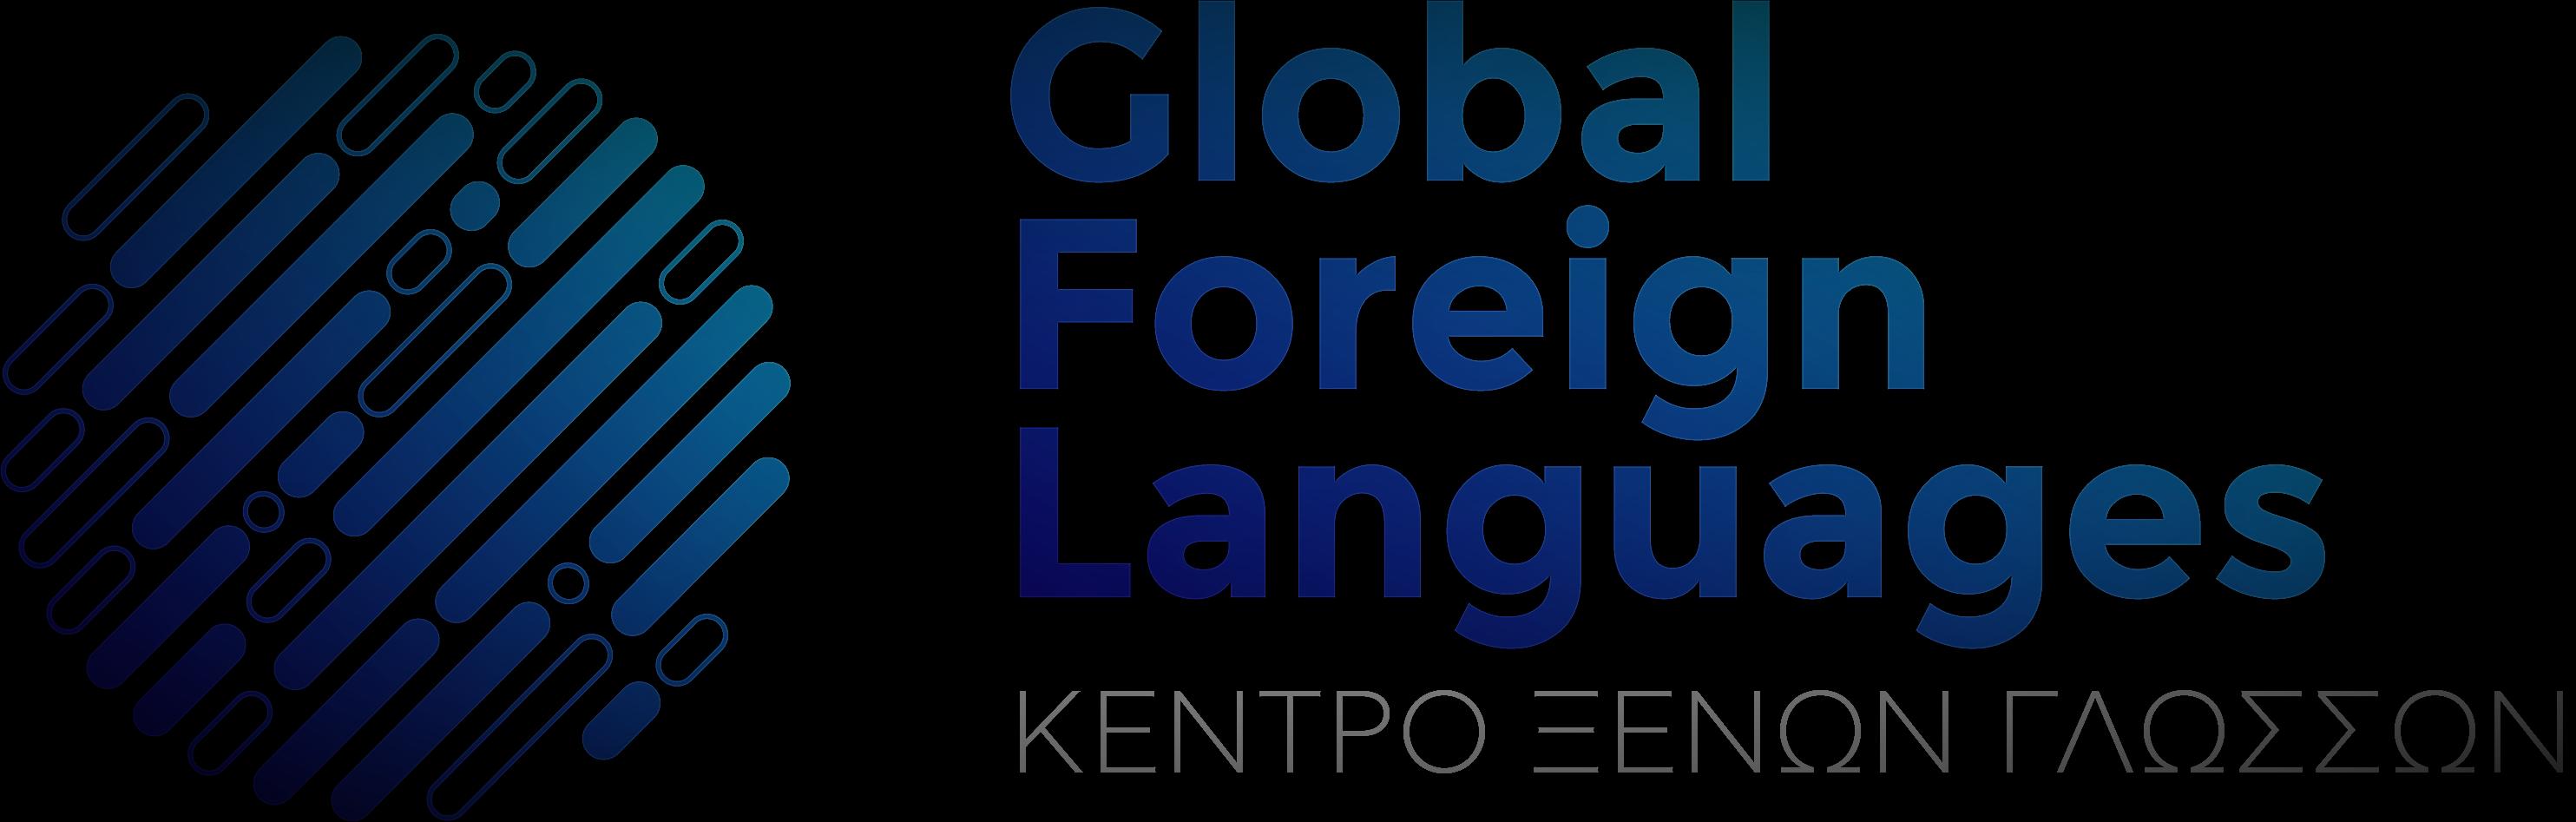 Global Foreign Languages - GFL